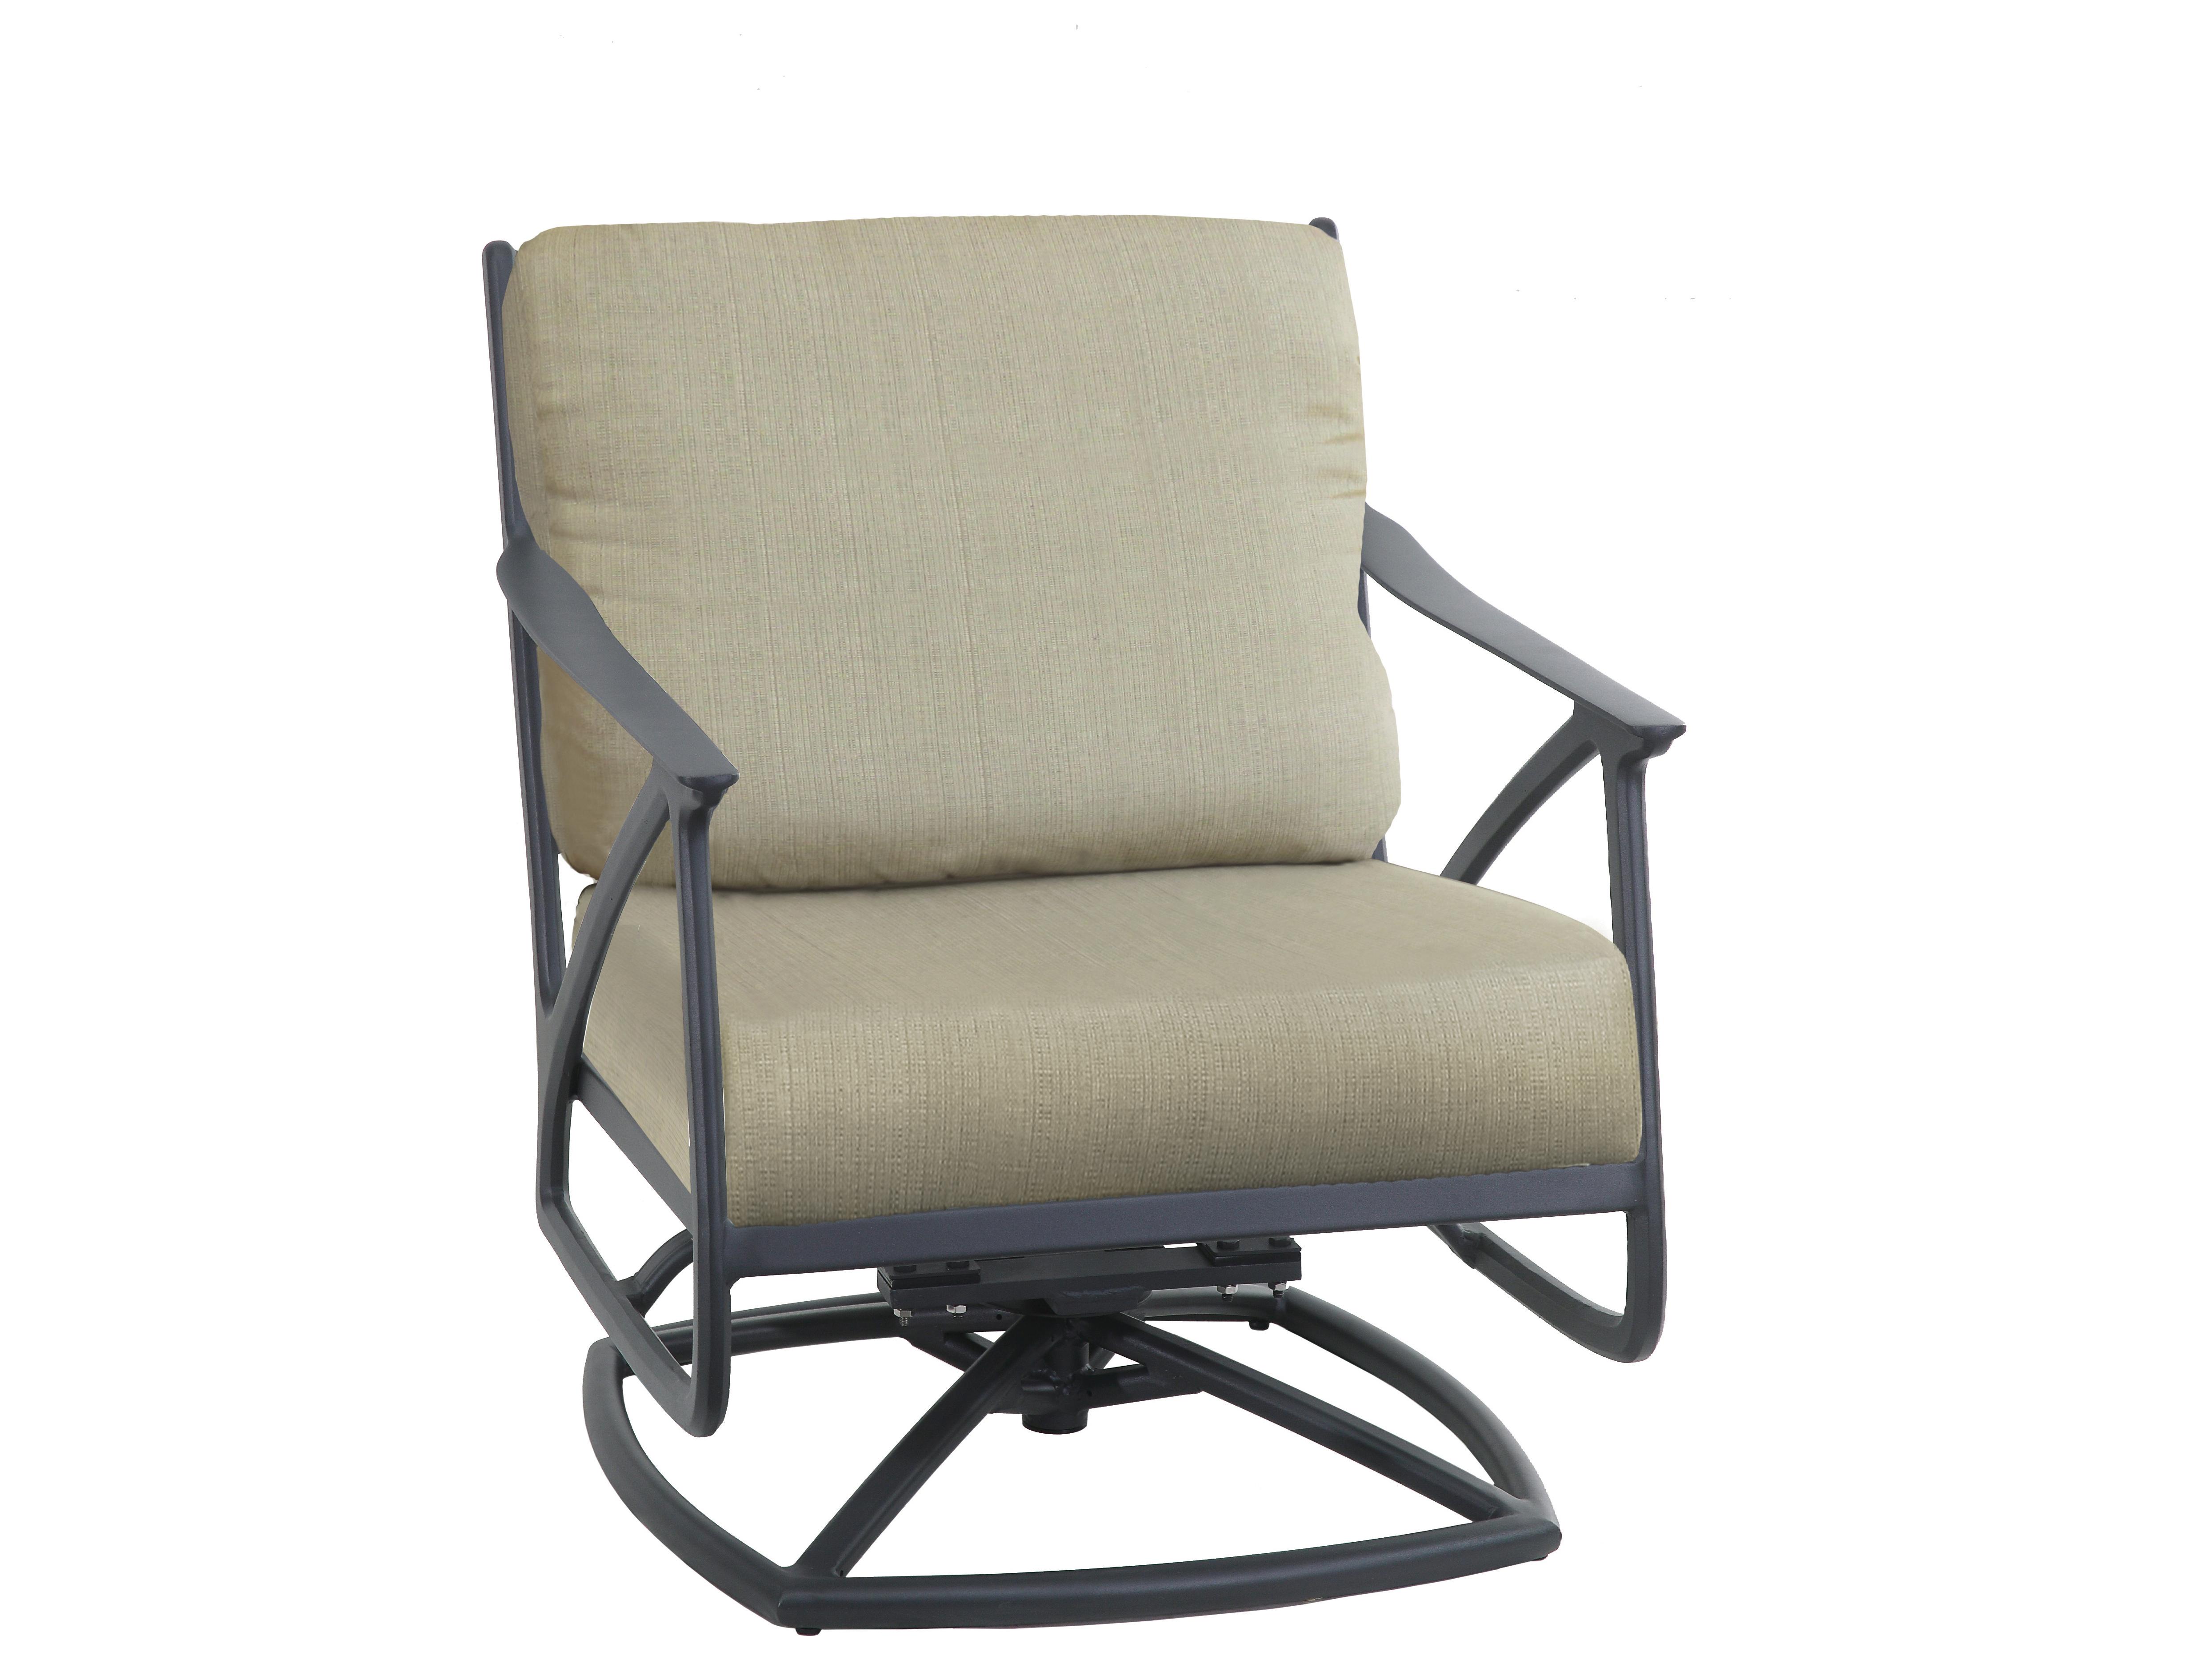 Amari Swivel Accent Chairs Throughout 2019 Gensun Amari Aluminum Csuhion Swivel Rocking Lounge Chair (Gallery 7 of 20)